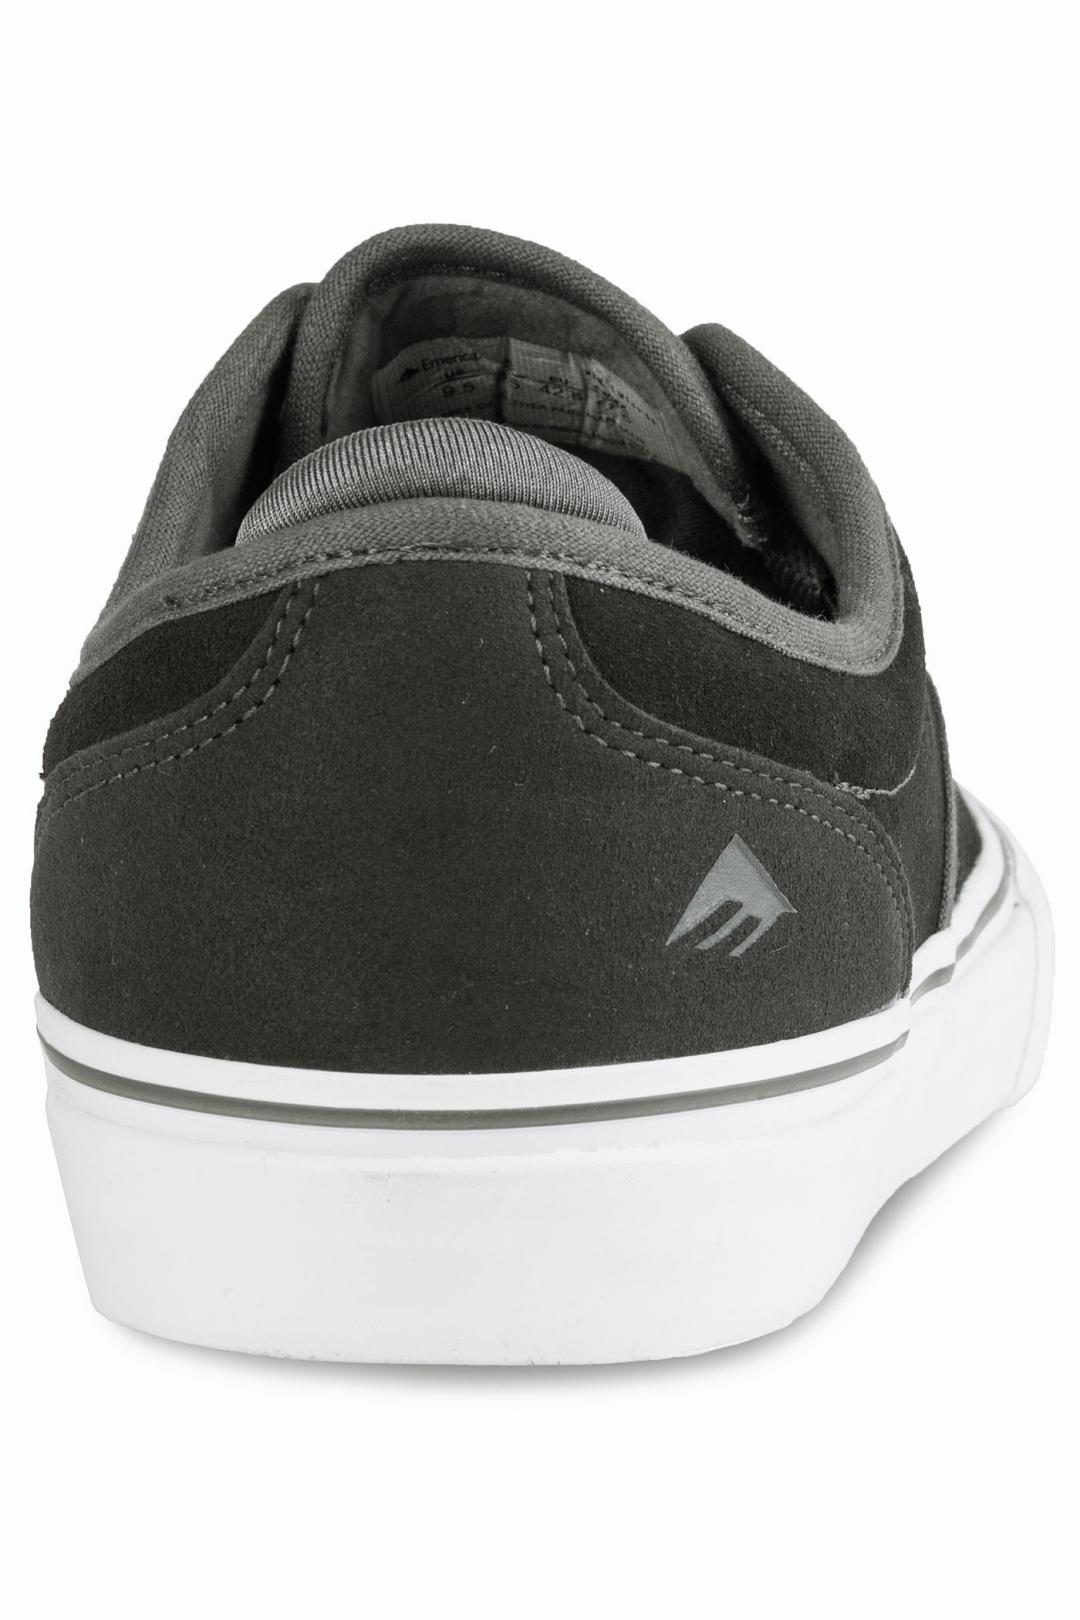 Uomo Emerica Wino G6 dark grey white | Sneaker